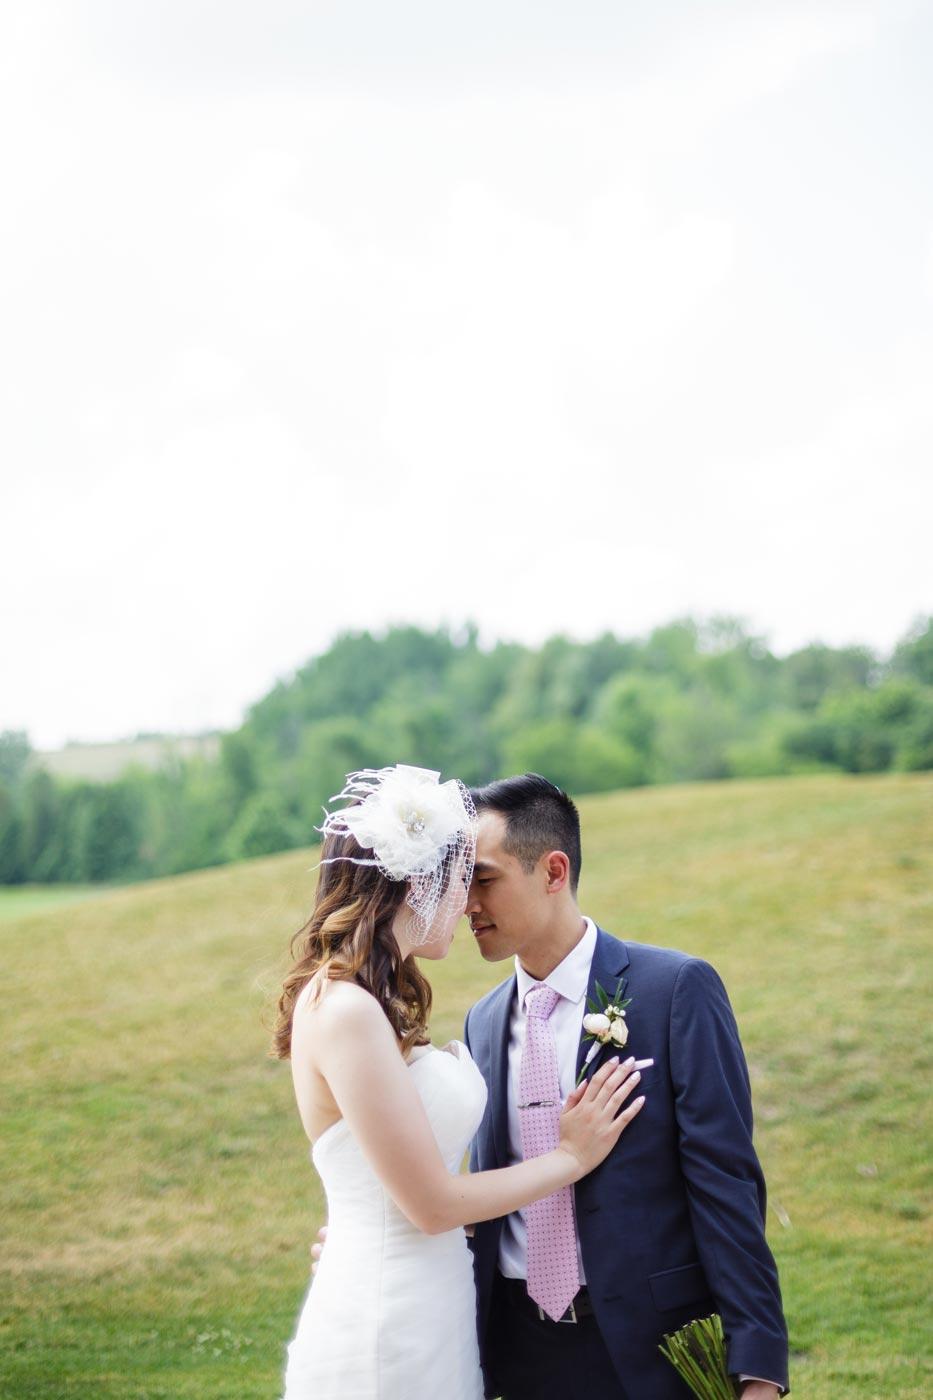 jessicahoang-savi-toronto-wedding-eagles-nest-22